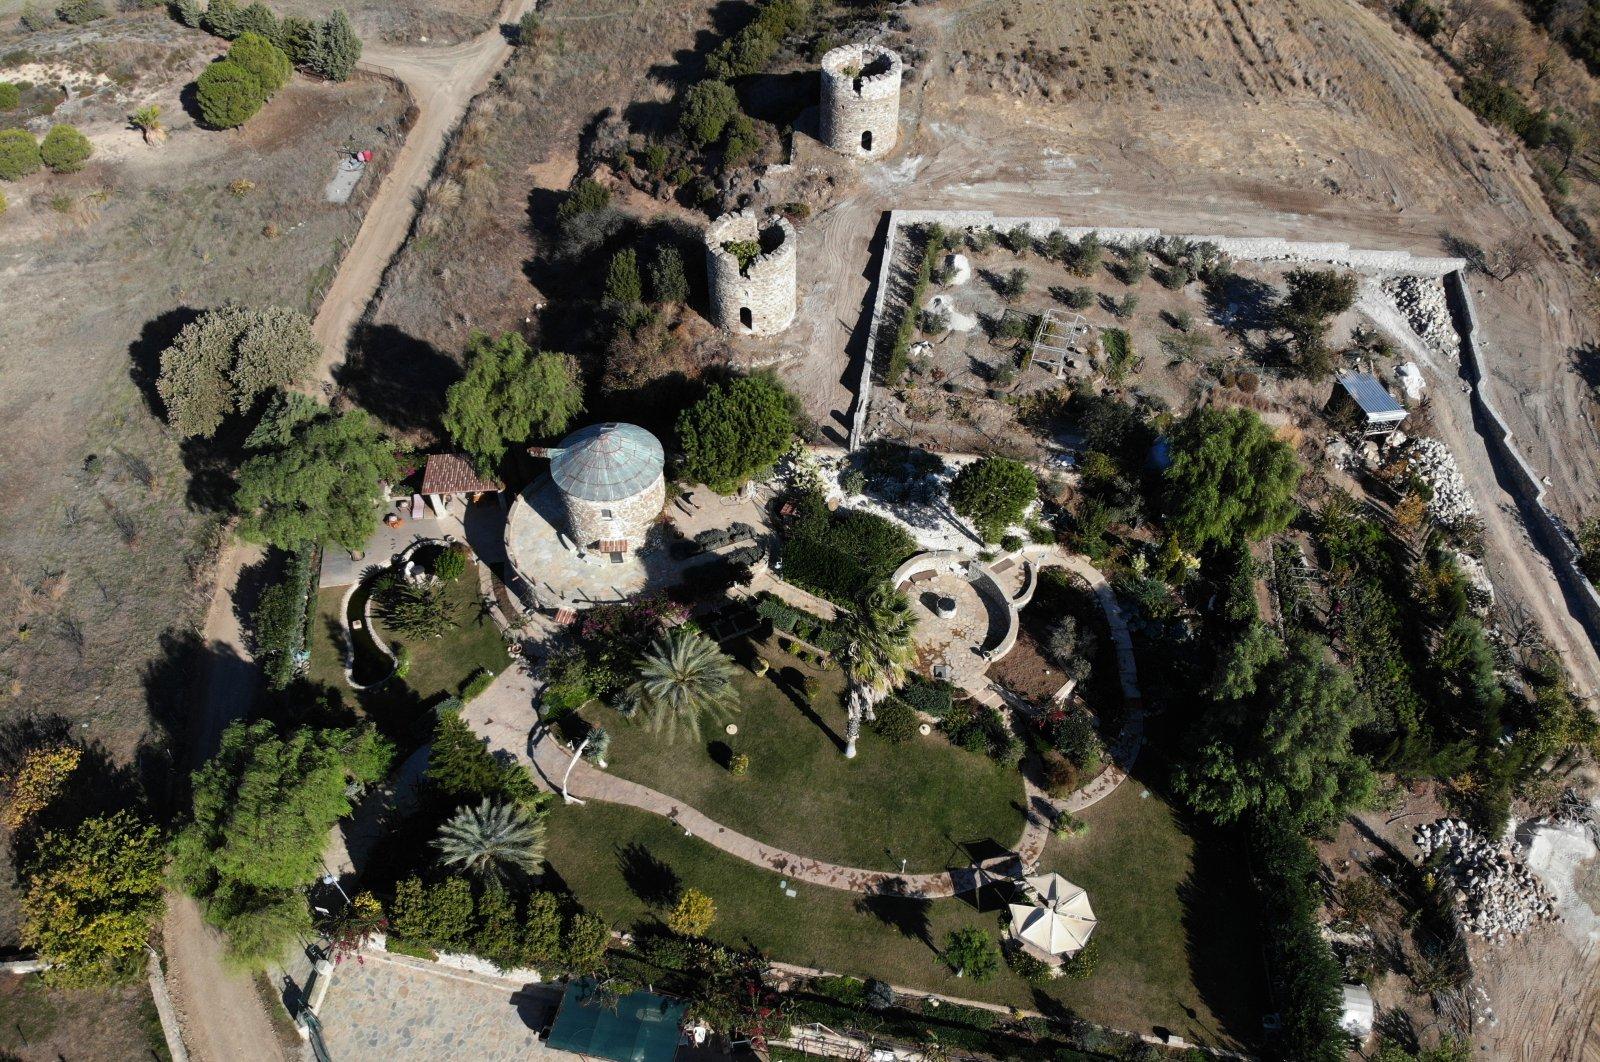 An aerial view of Ali Avseven's garden where he grows saplings and plants trees, Datça, Muğla province, western Turkey, Dec. 3, 2020. (AA Photo)